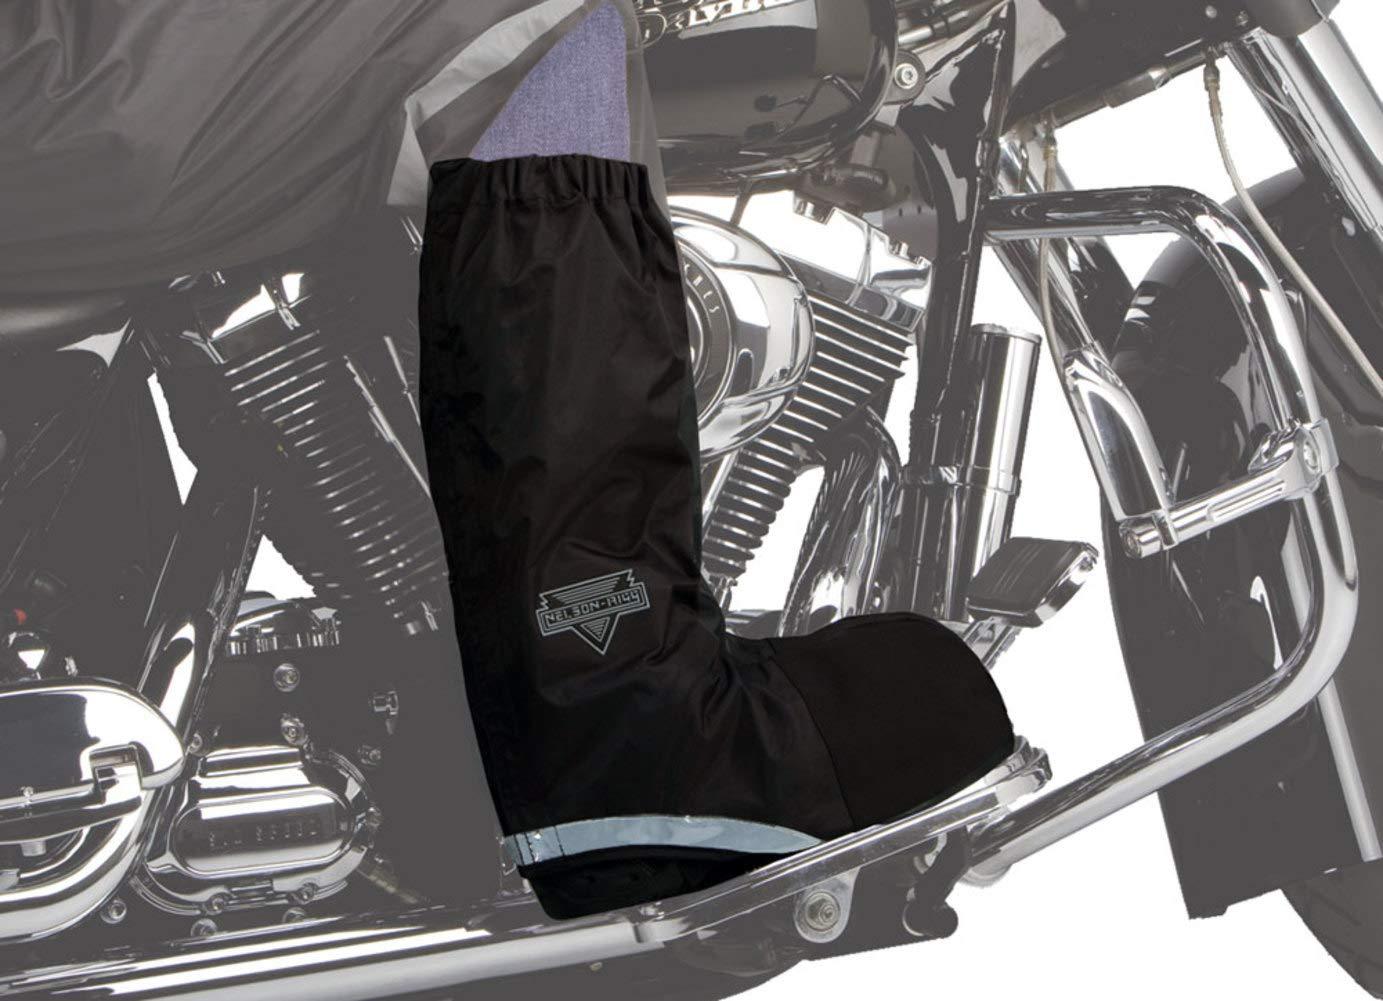 Nelson-Rigg WPRB-100 Waterproof Rain Men's Street Motorcycle Boots - Black/Small 21-1283